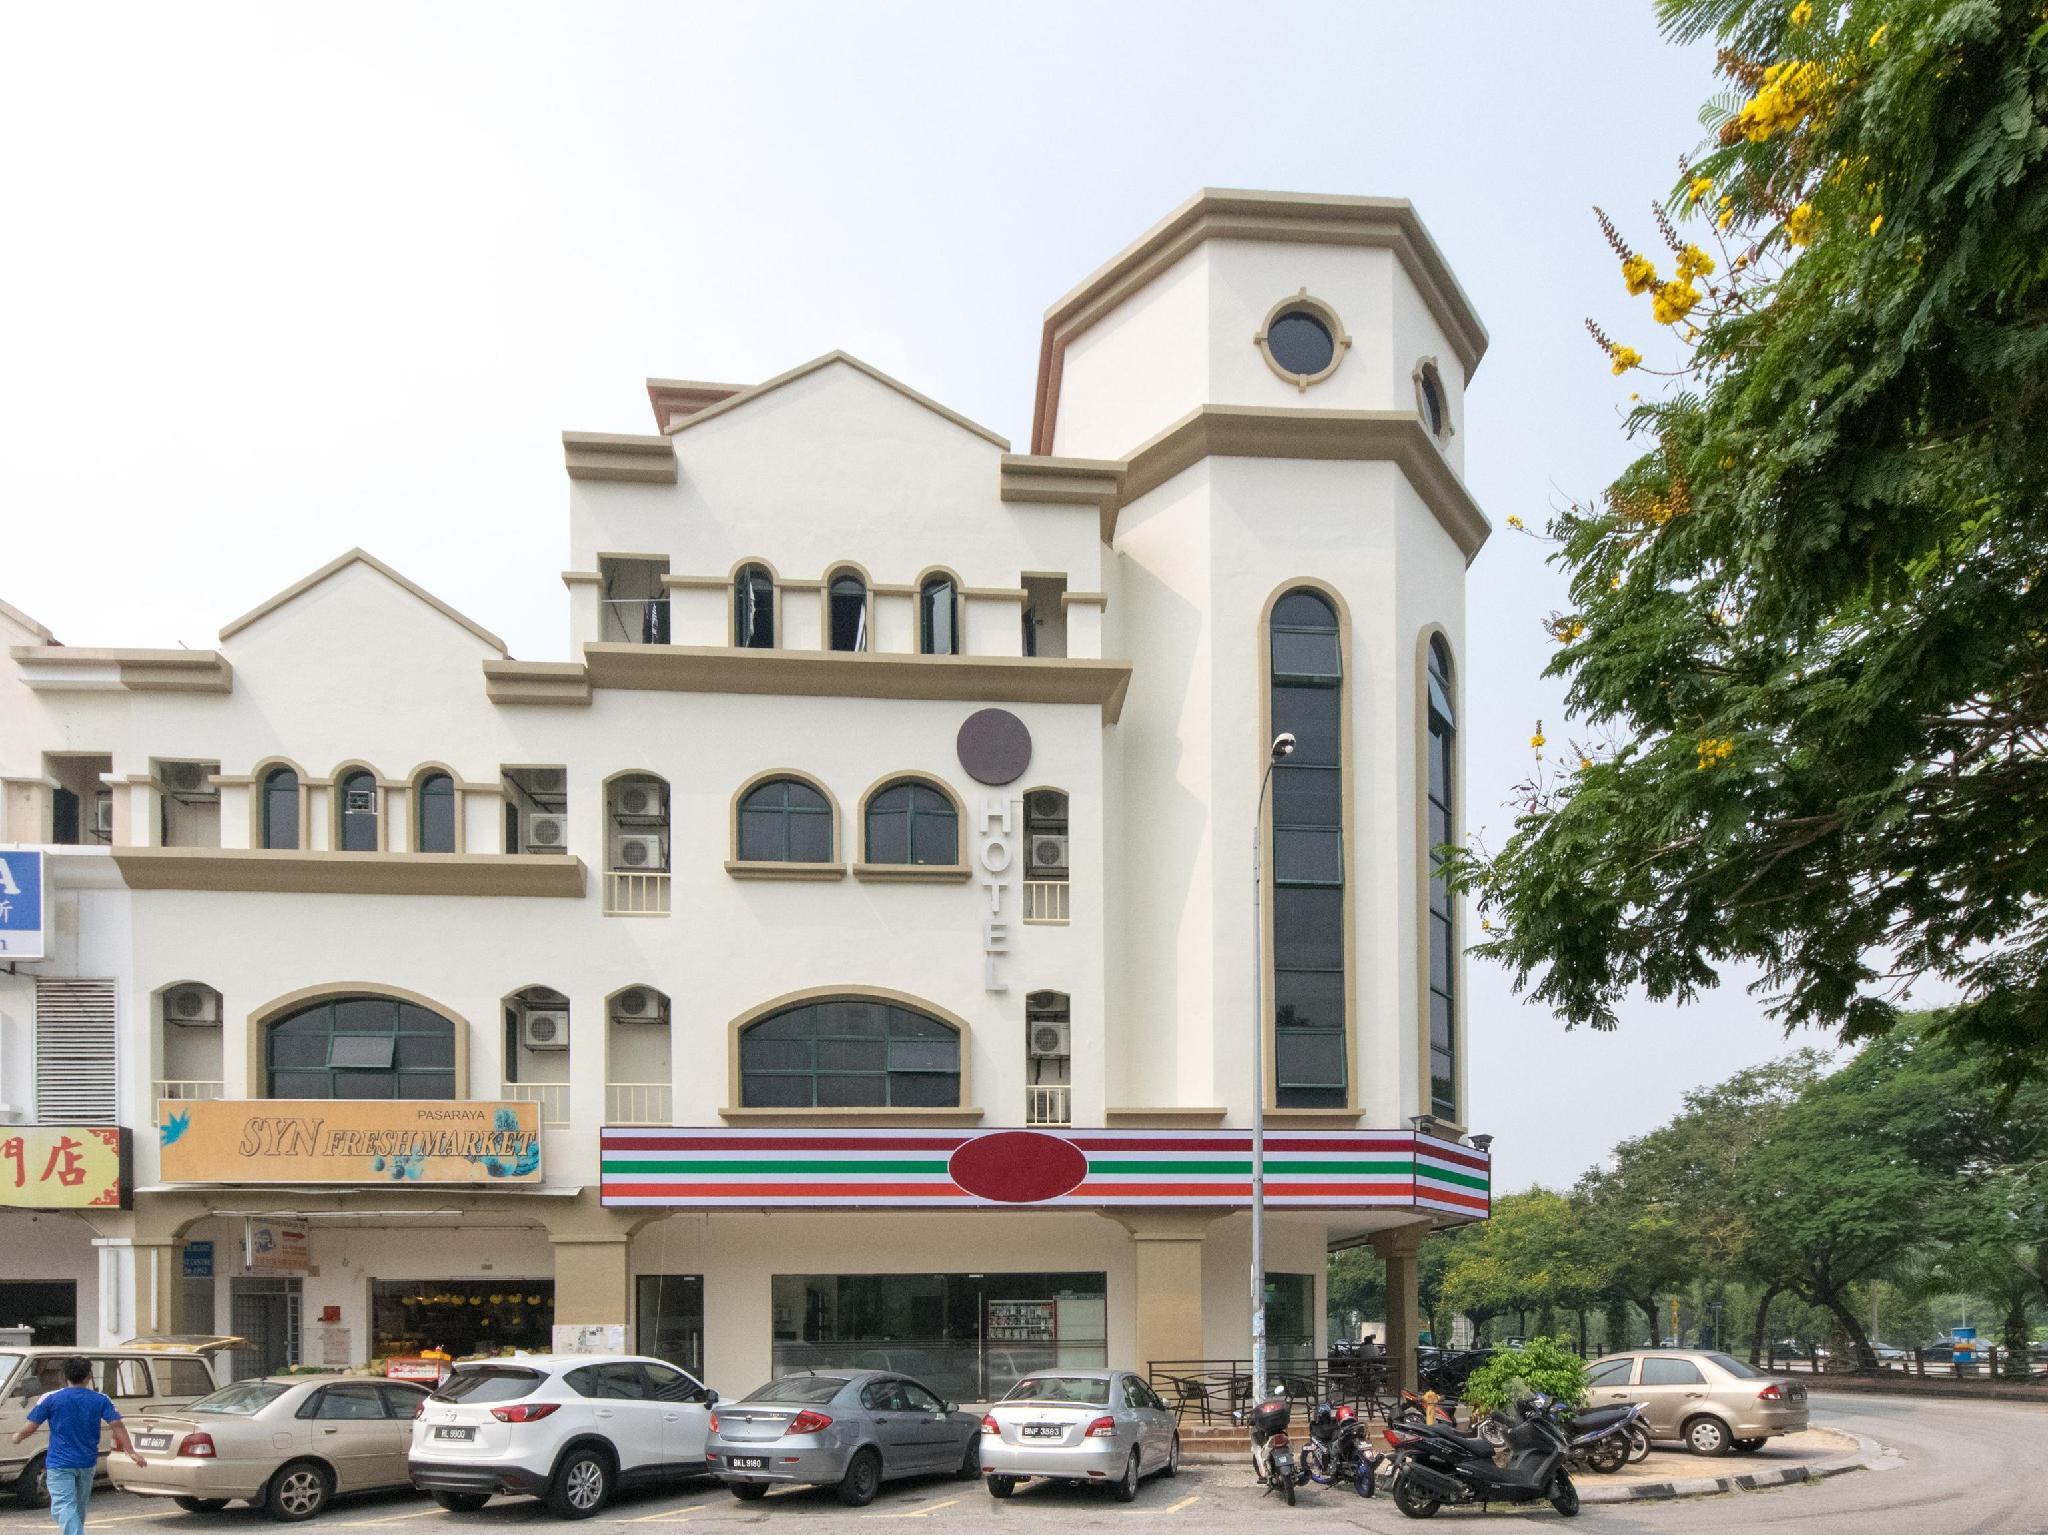 OYO 142 SH Hotel Kota Damansara, Kuala Lumpur